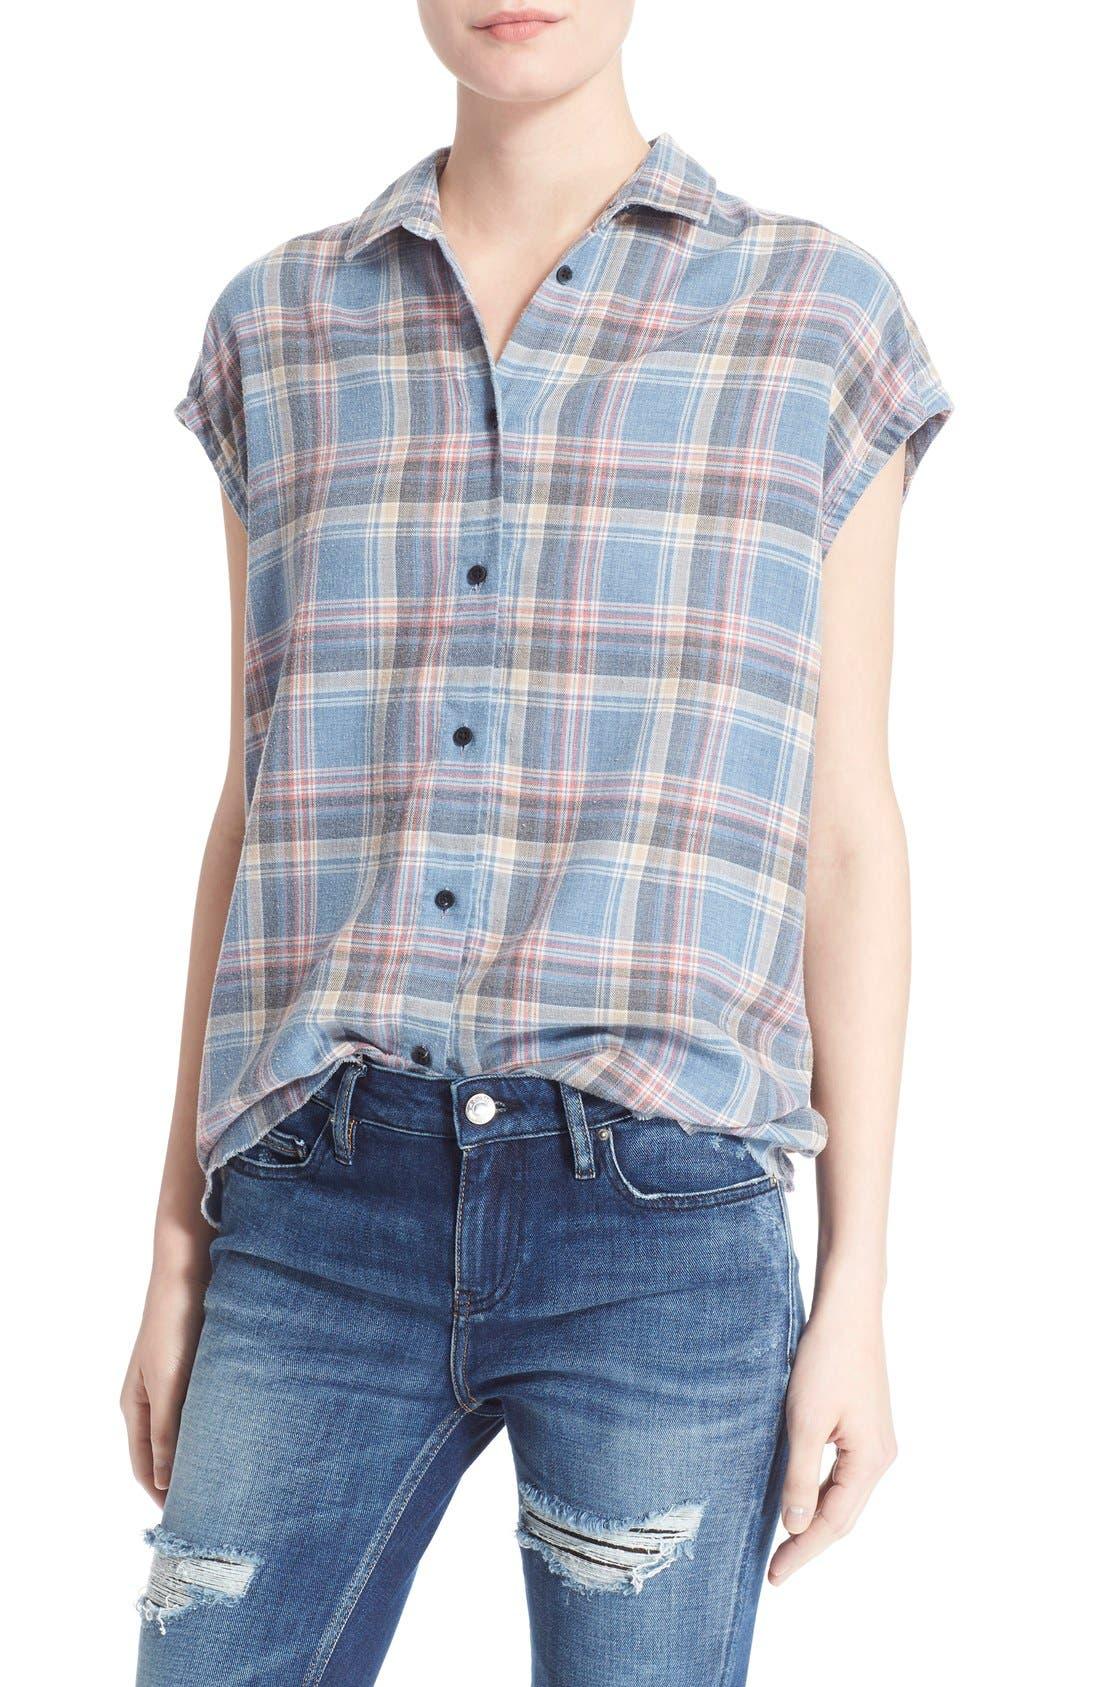 Main Image - IRO 'Dally' Woven Plaid Cap Sleeve Shirt